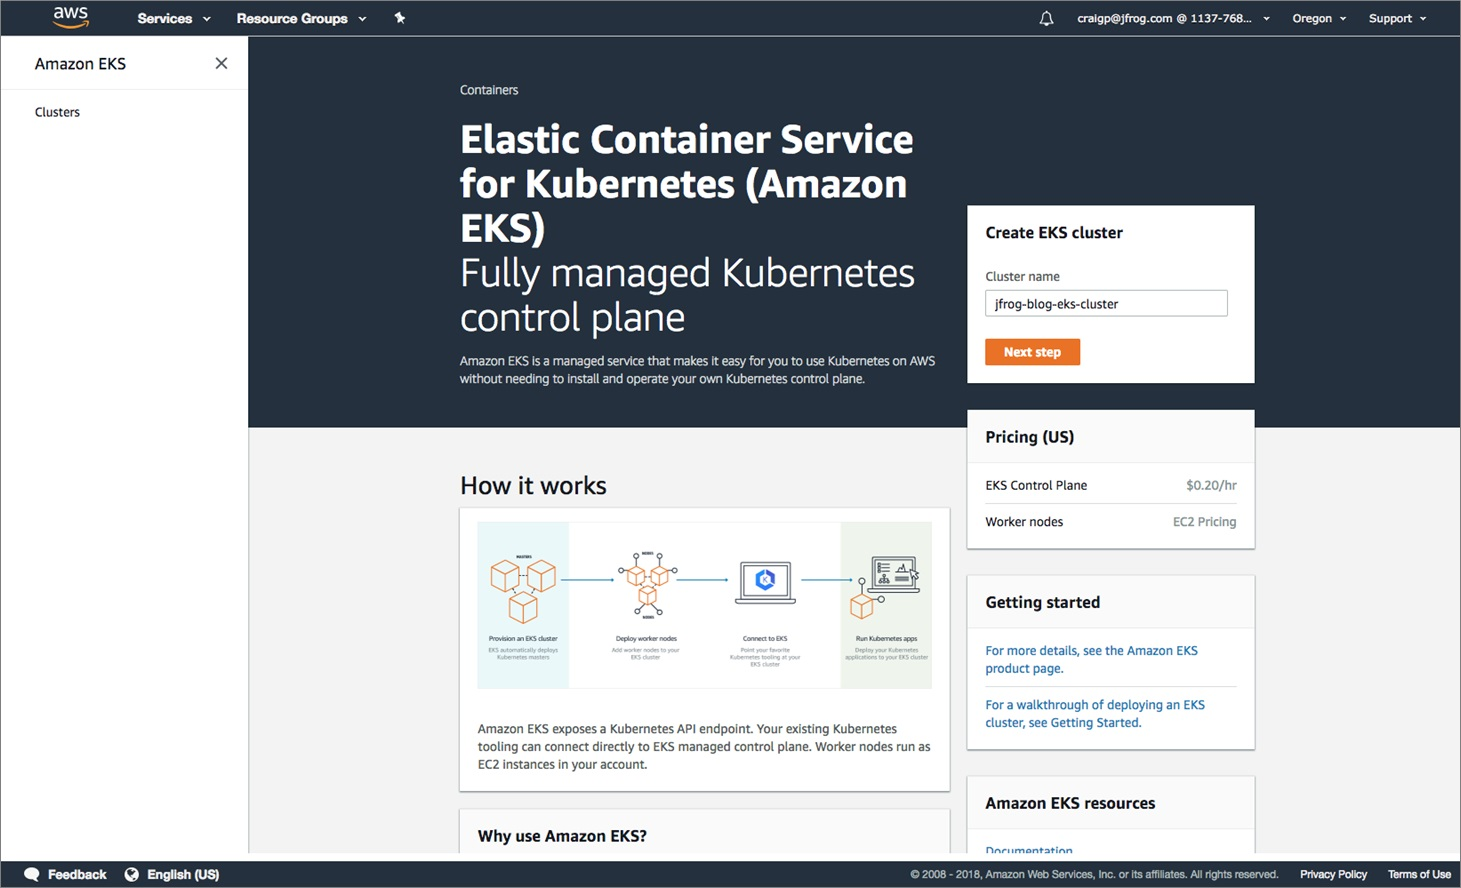 JFrog - Amazon EKS Cluster Creation-1